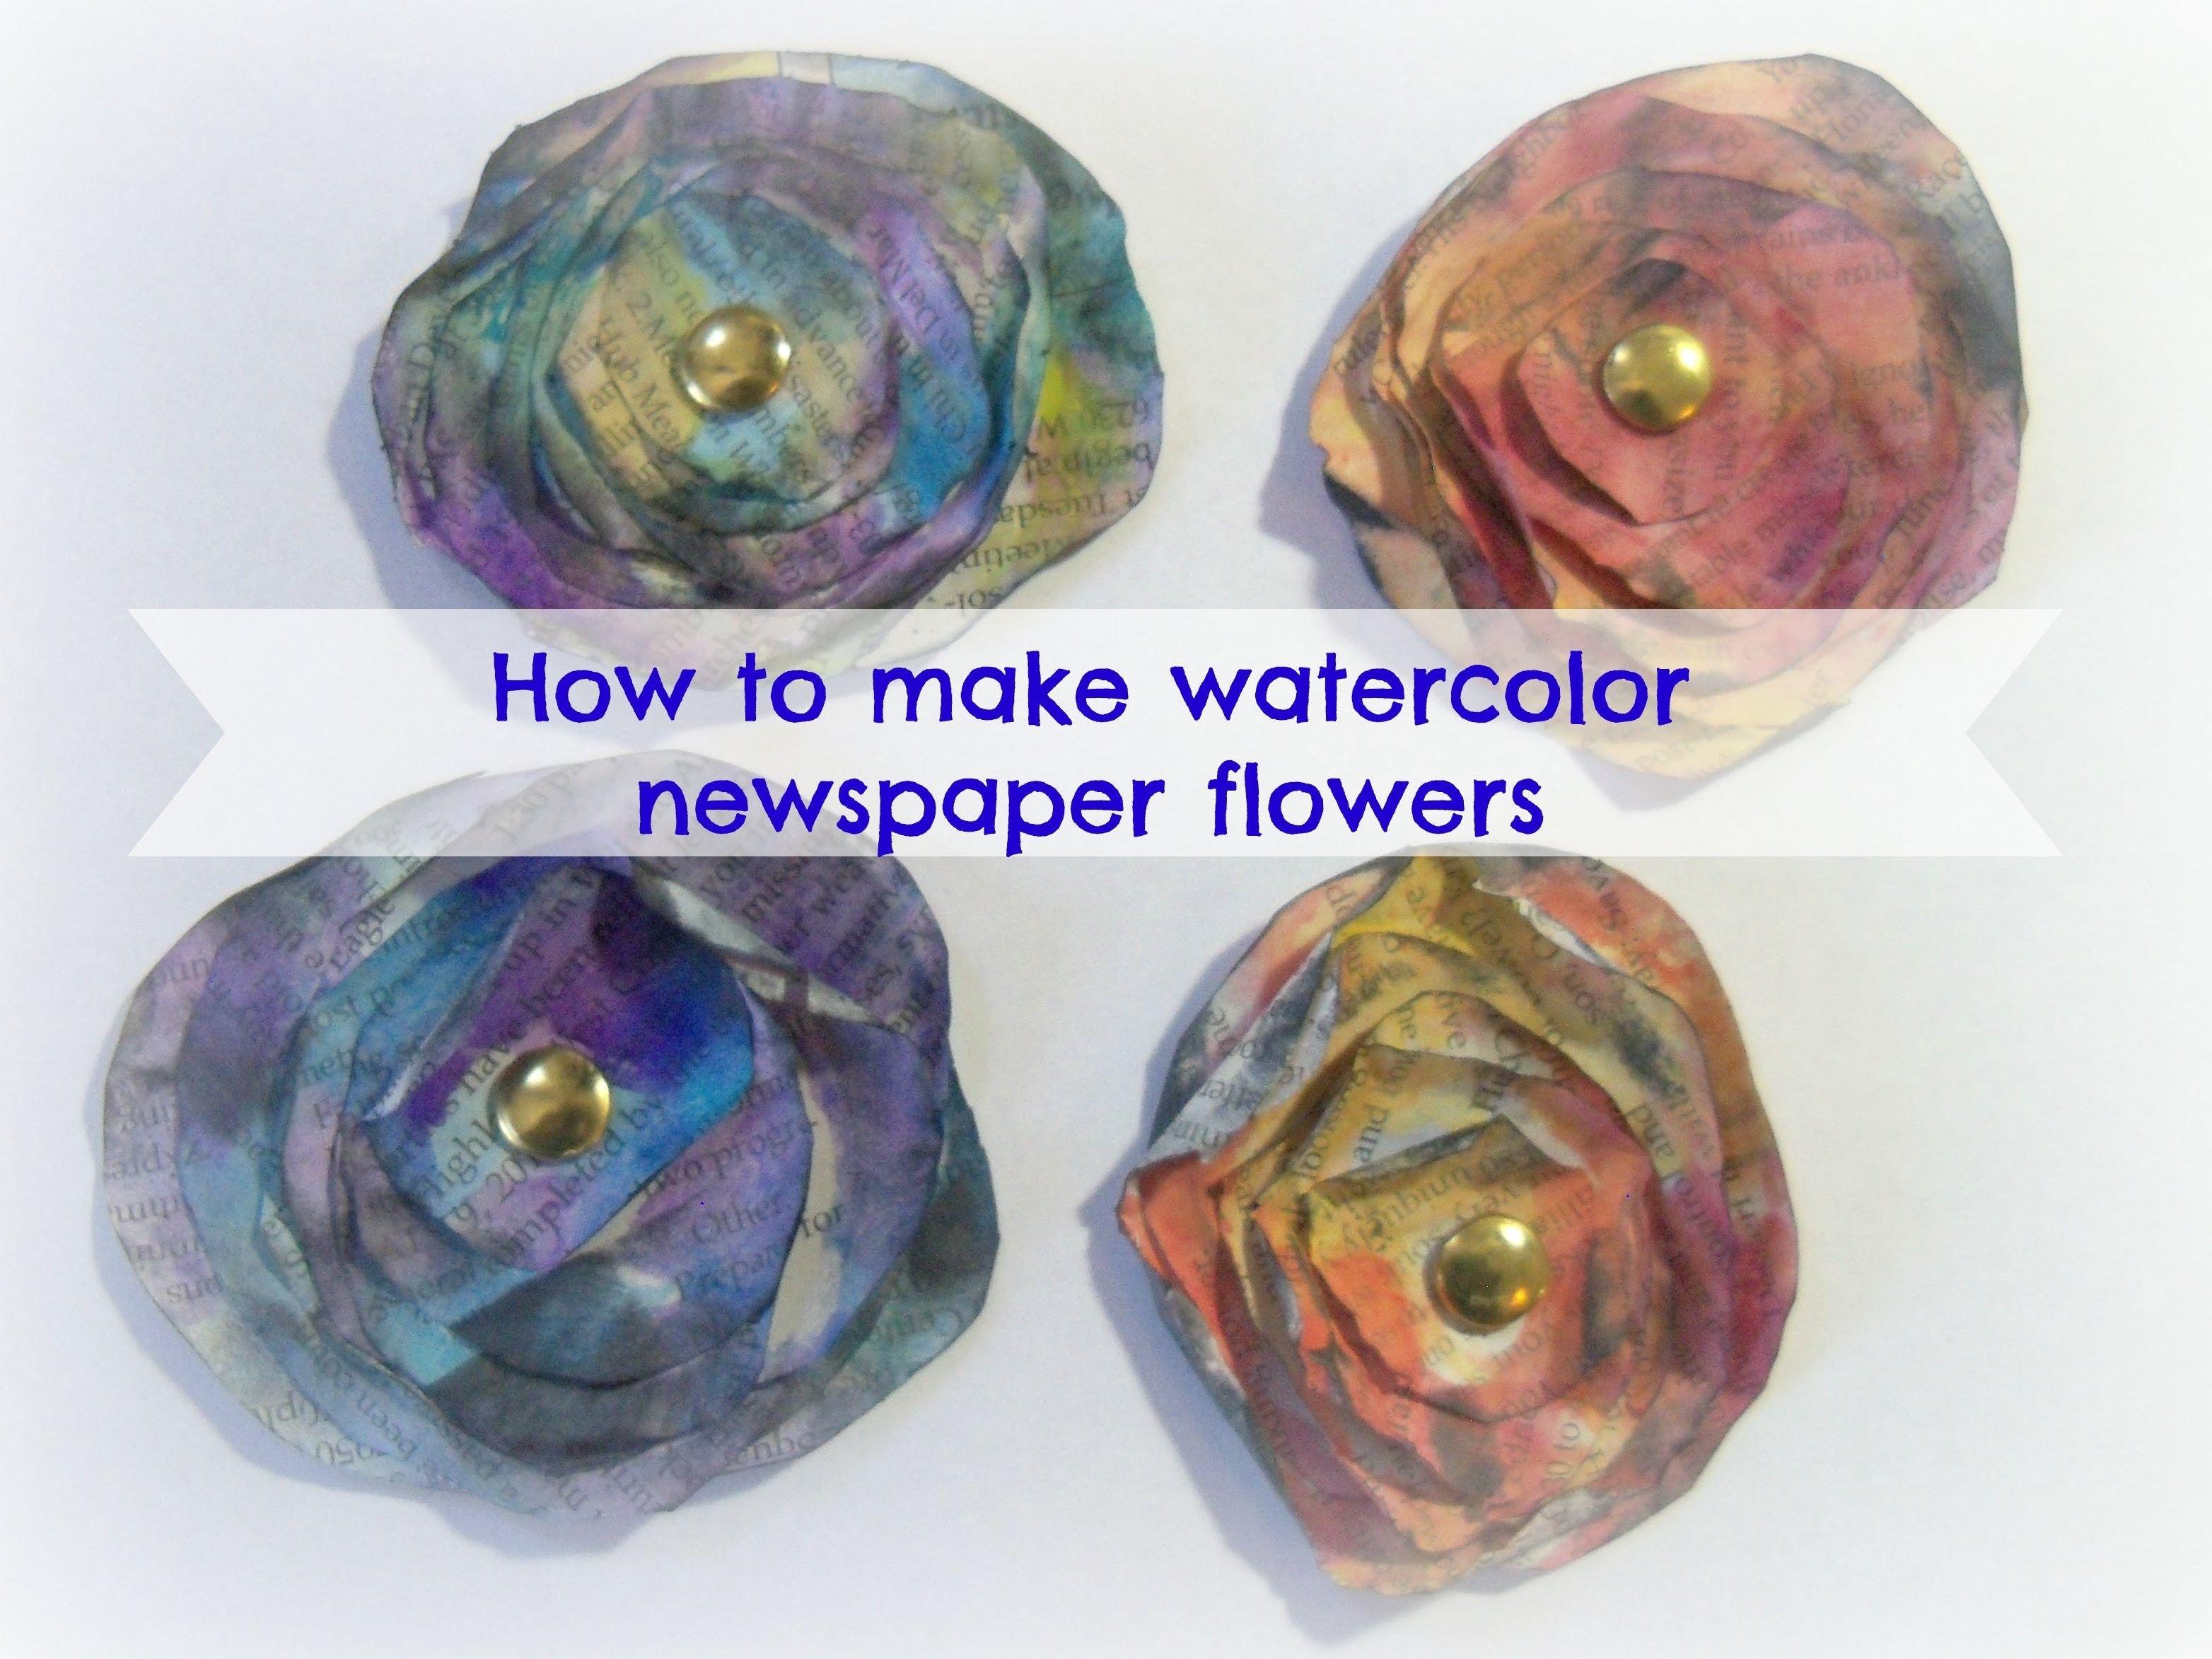 How To Make Newspaper Flowers Diy Mixed Media Watercolor Newspaper